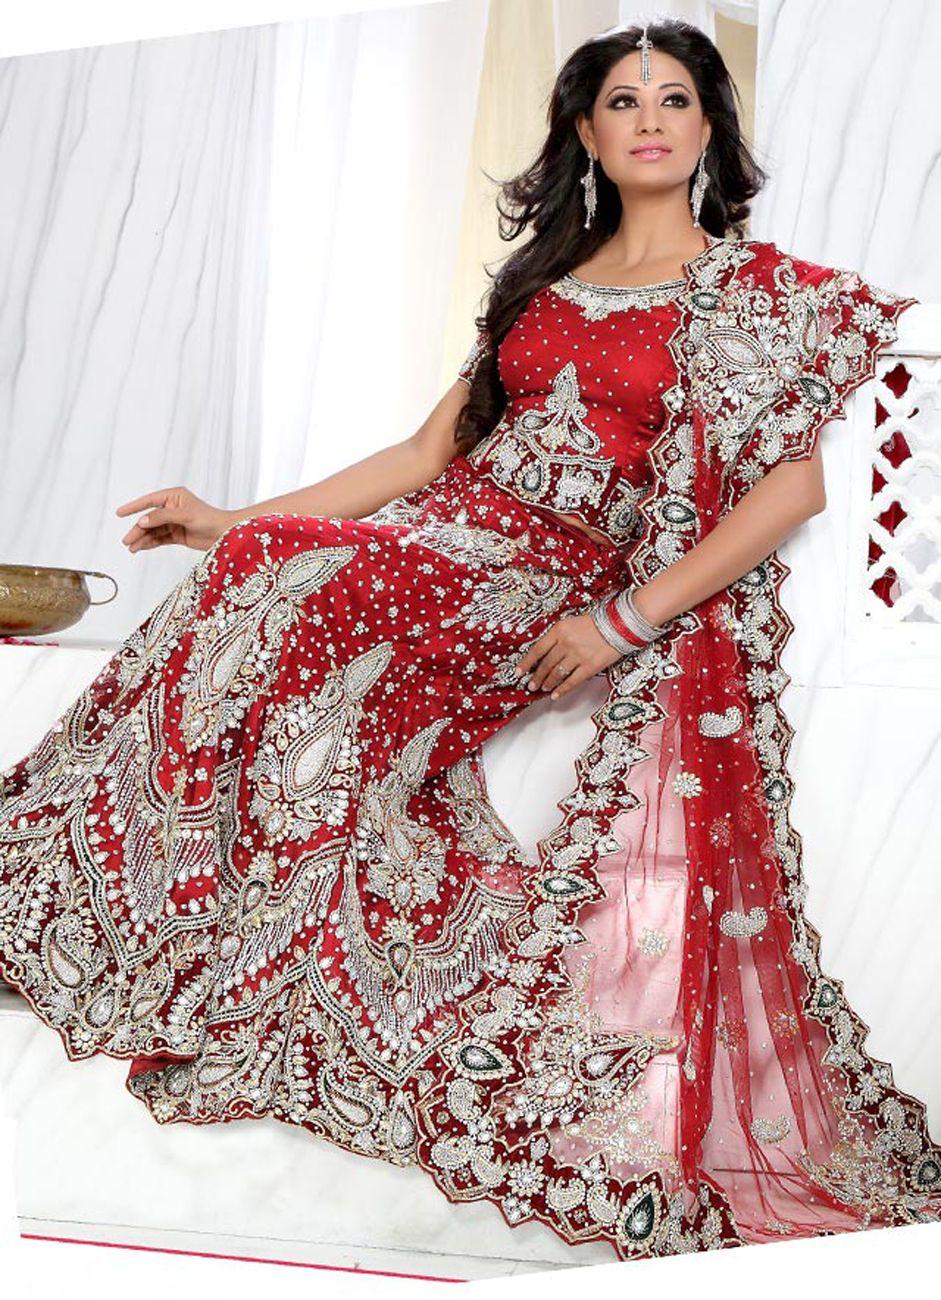 Bridal lengha | Dress | Pinterest